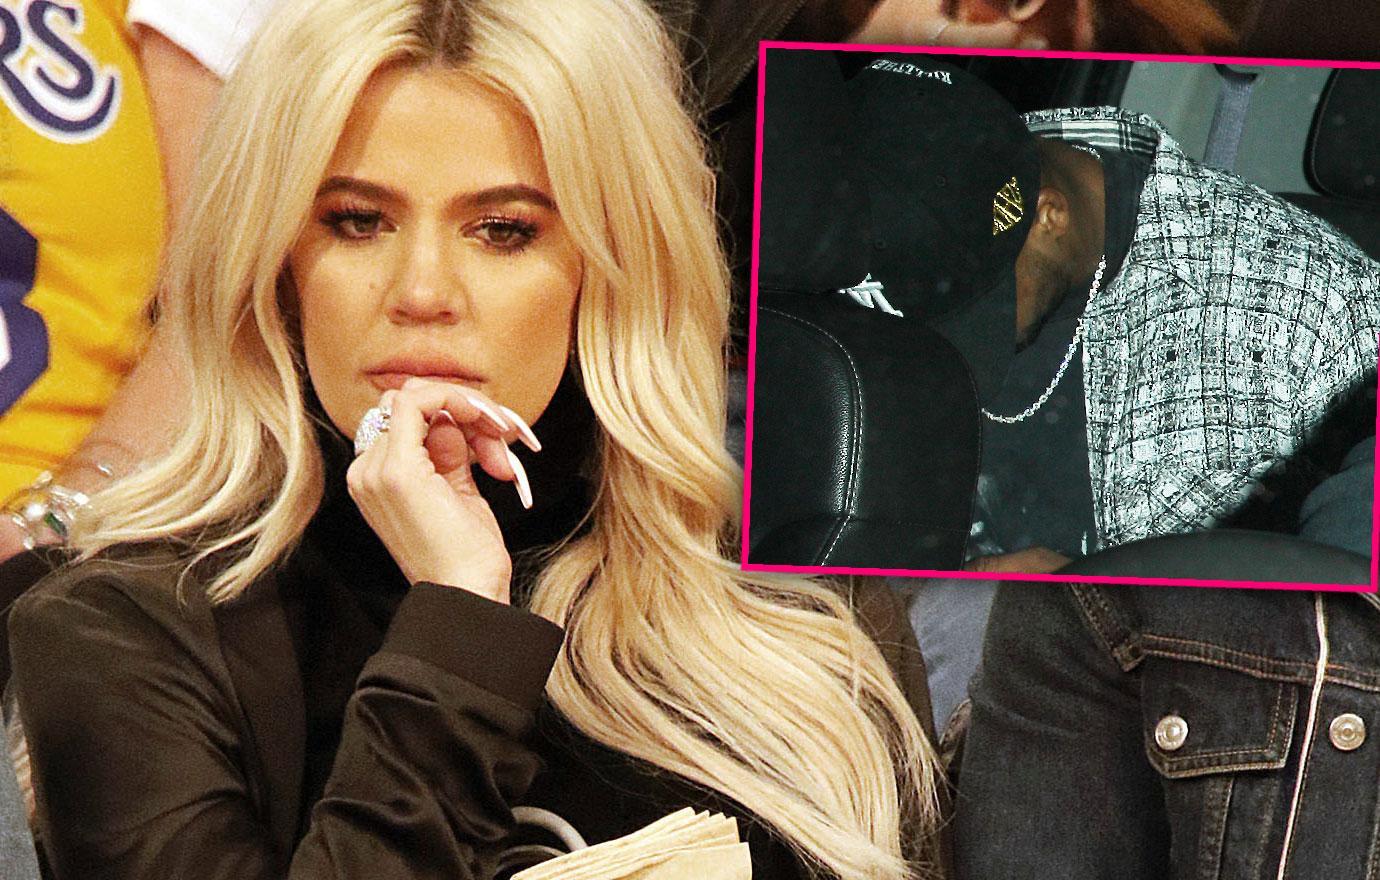 Khloe Kardashian Baby Daddy Tristan Leaves Restaurant After Split